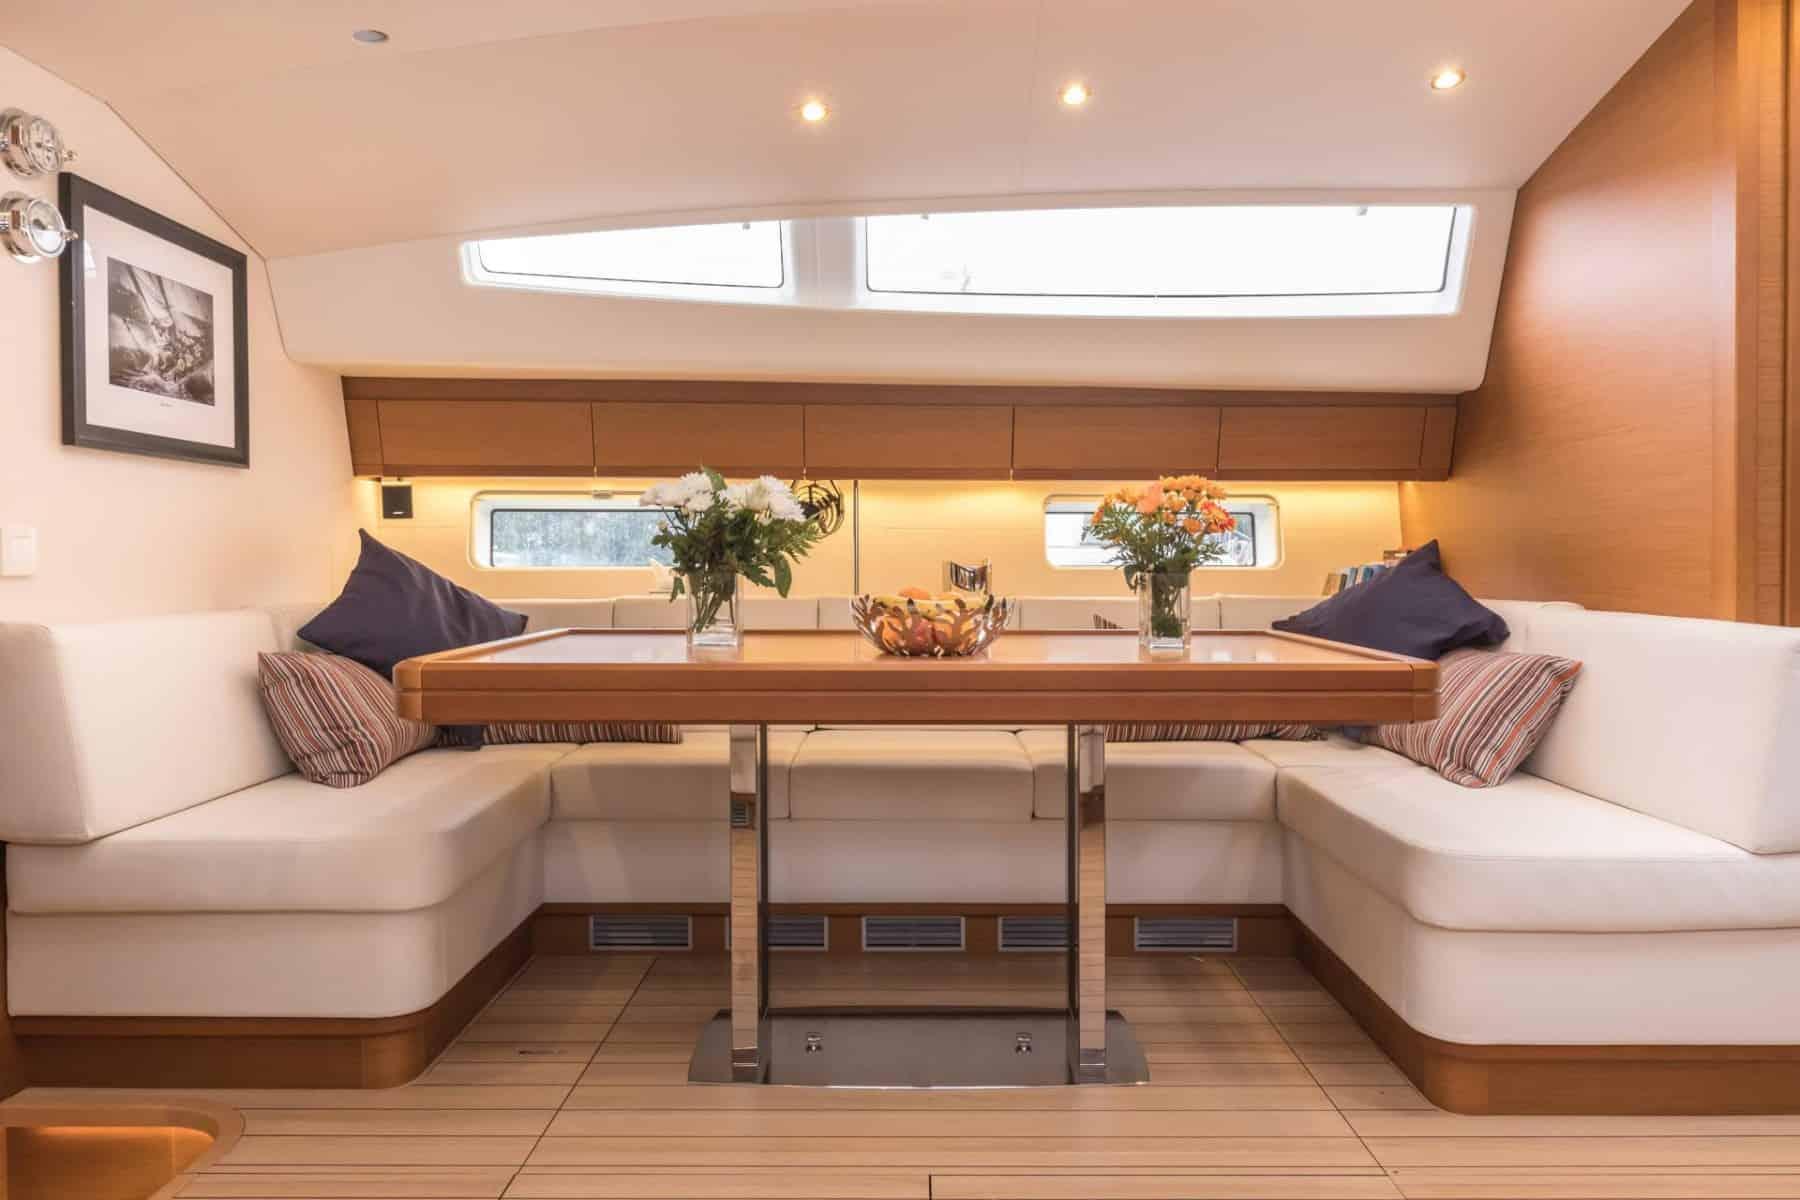 Jeanneau-64-interior-saloon-2-charter-ownership-yacht